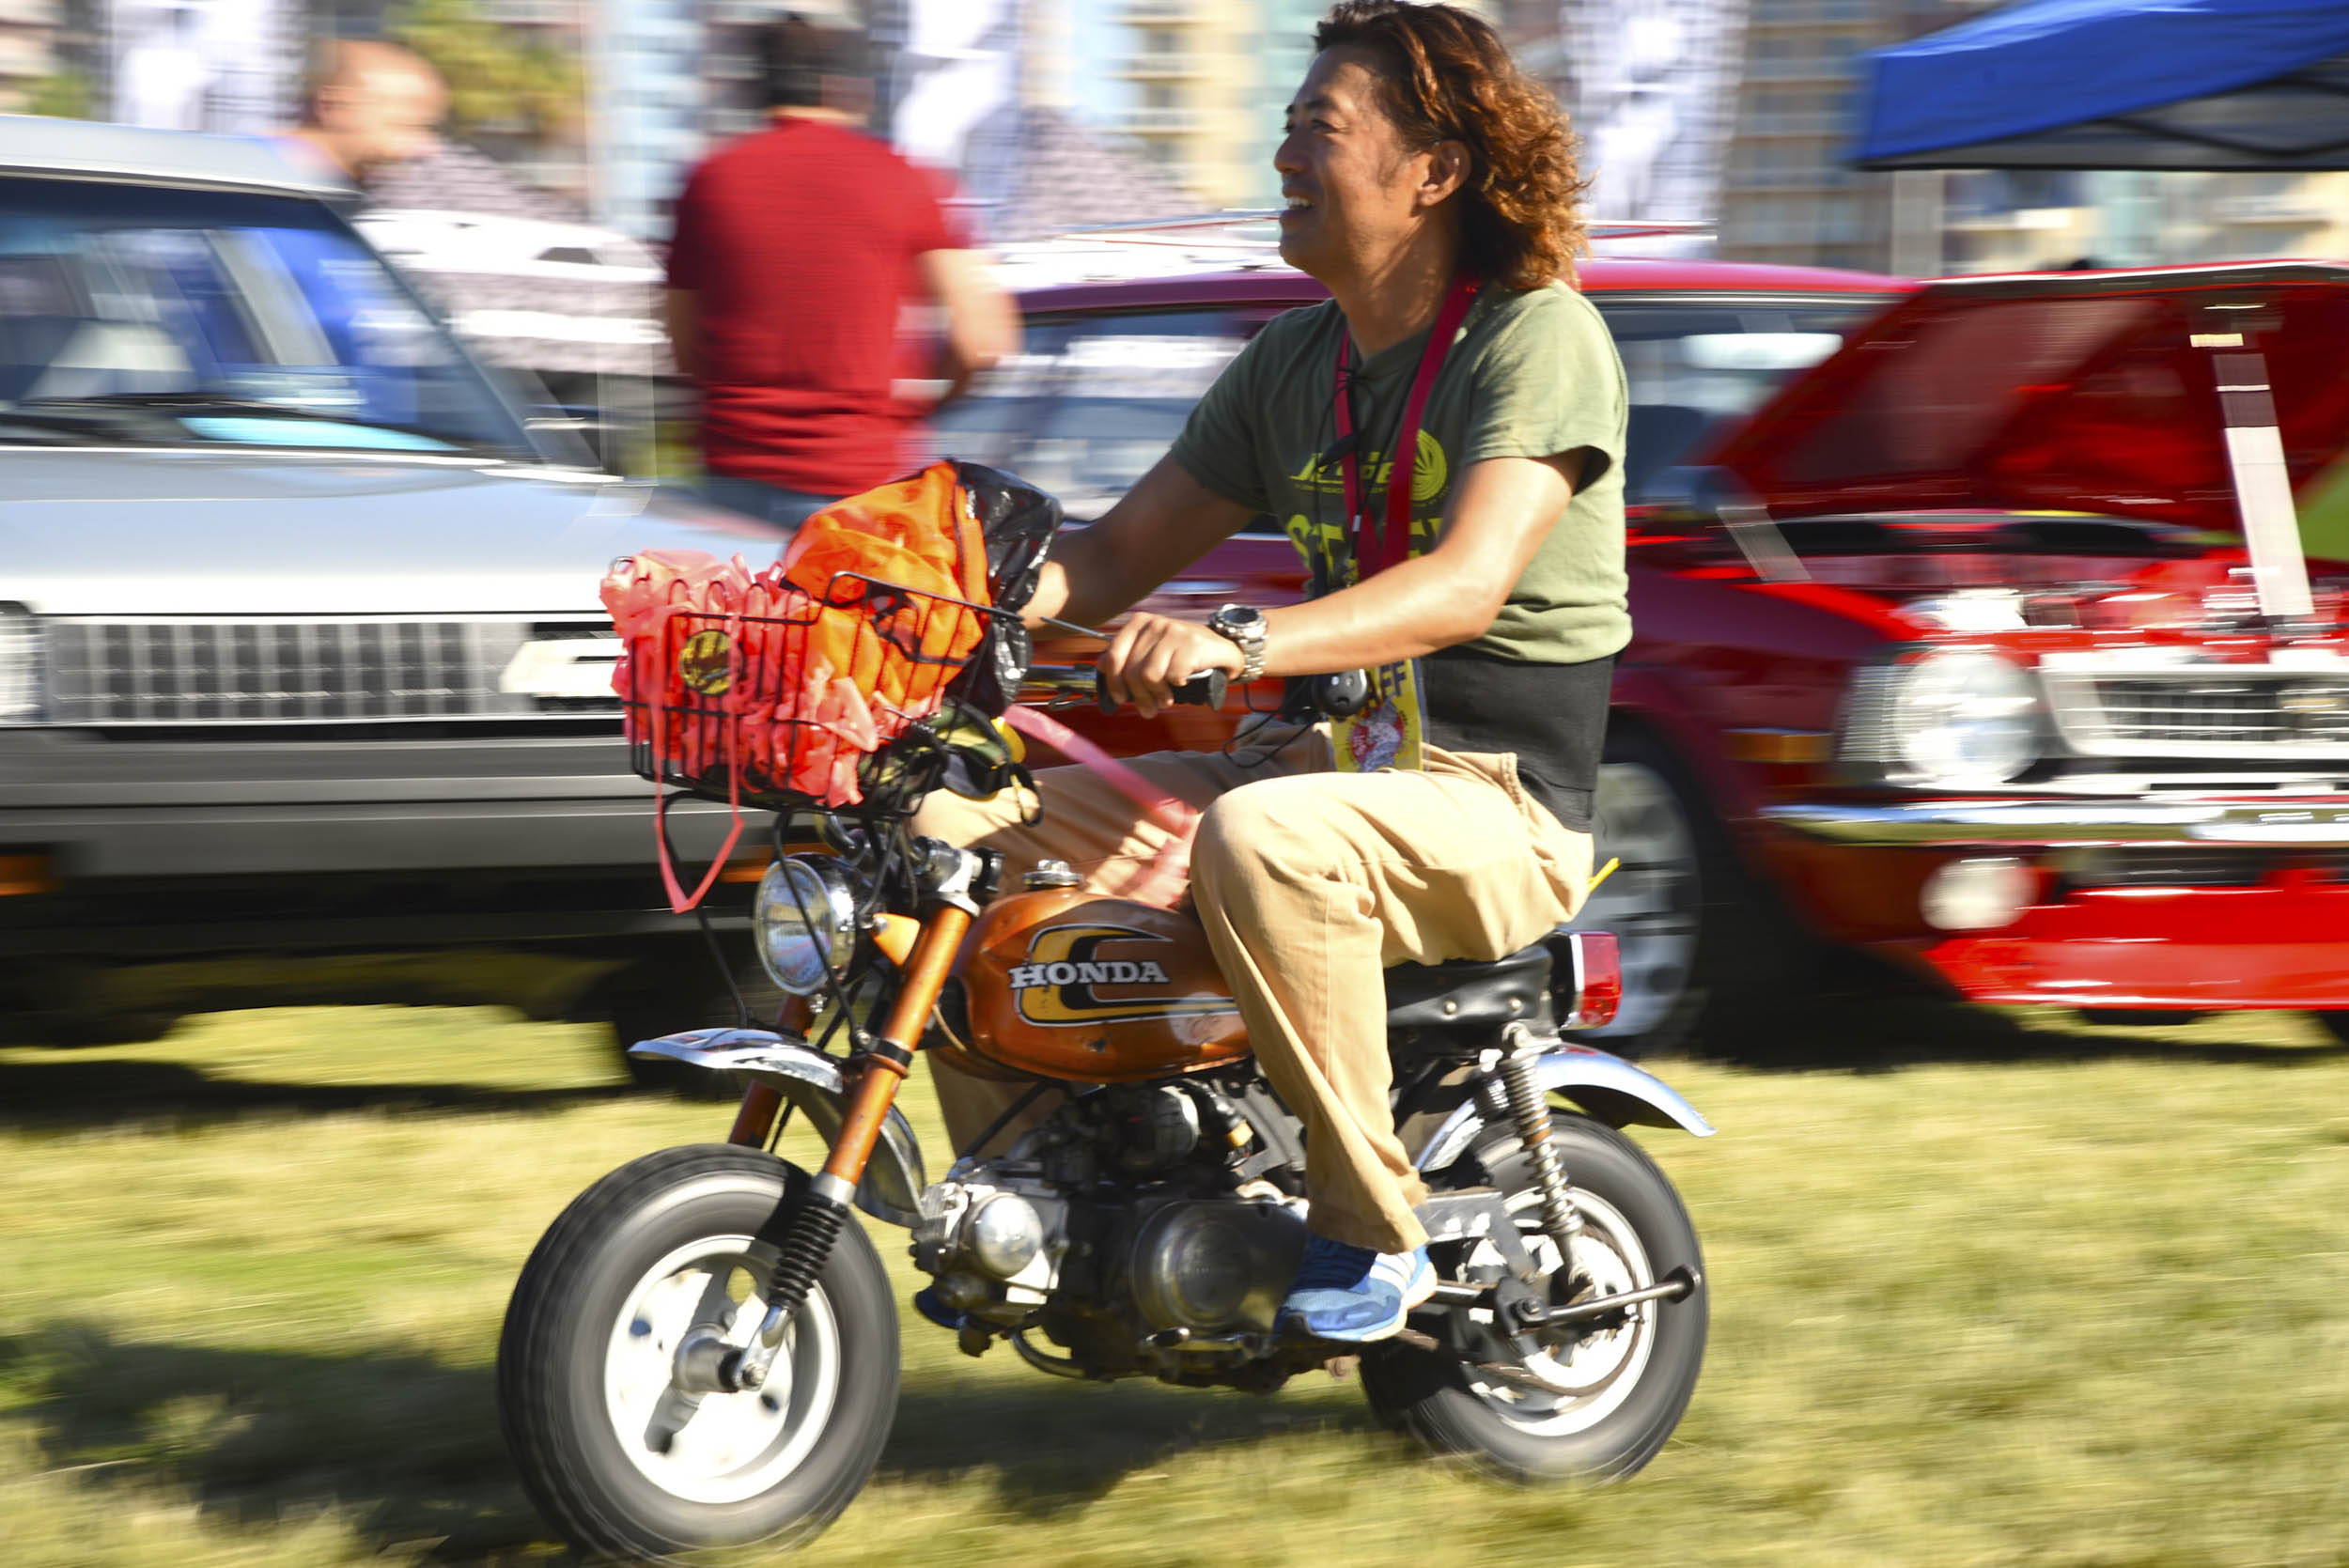 Honda mini bike at JCCS